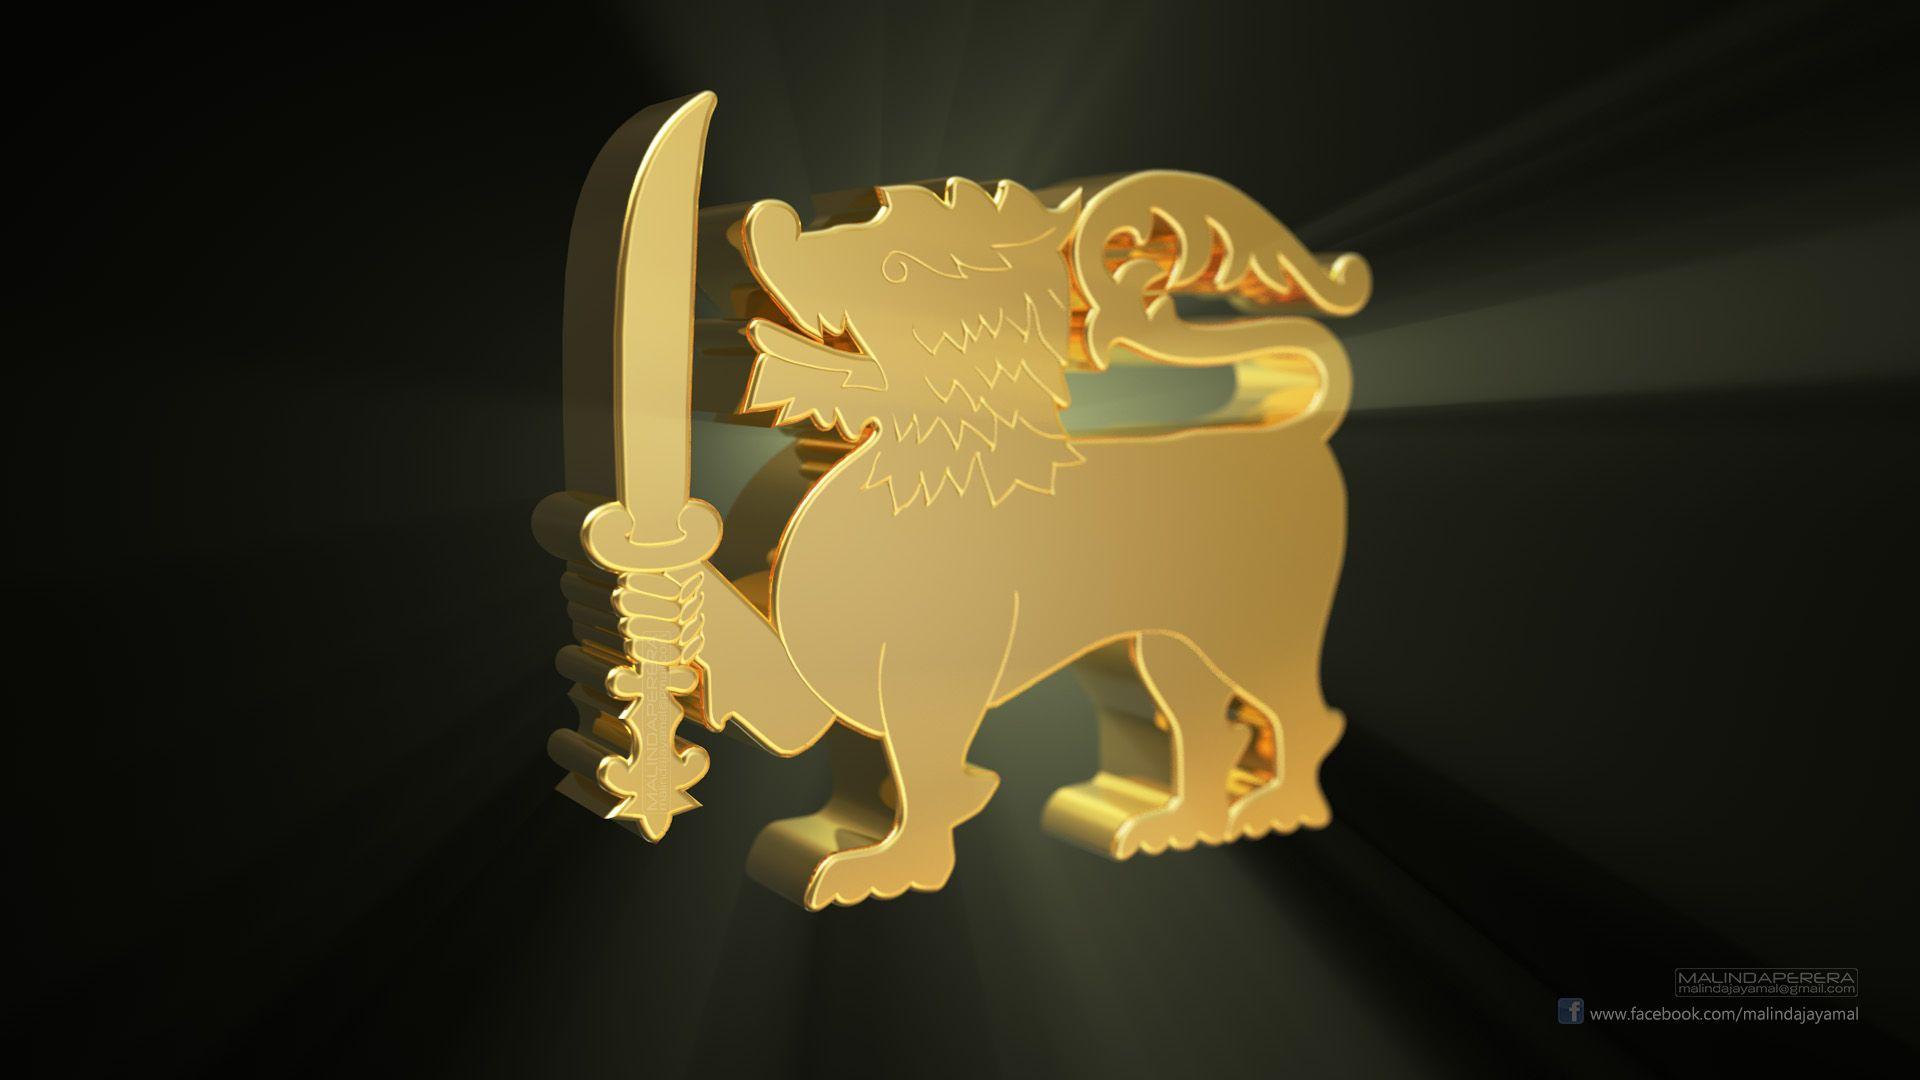 Golden Lion Hd Wallpaper 1080 By Malindaperera On - Sri Lanka Flag Lion , HD Wallpaper & Backgrounds